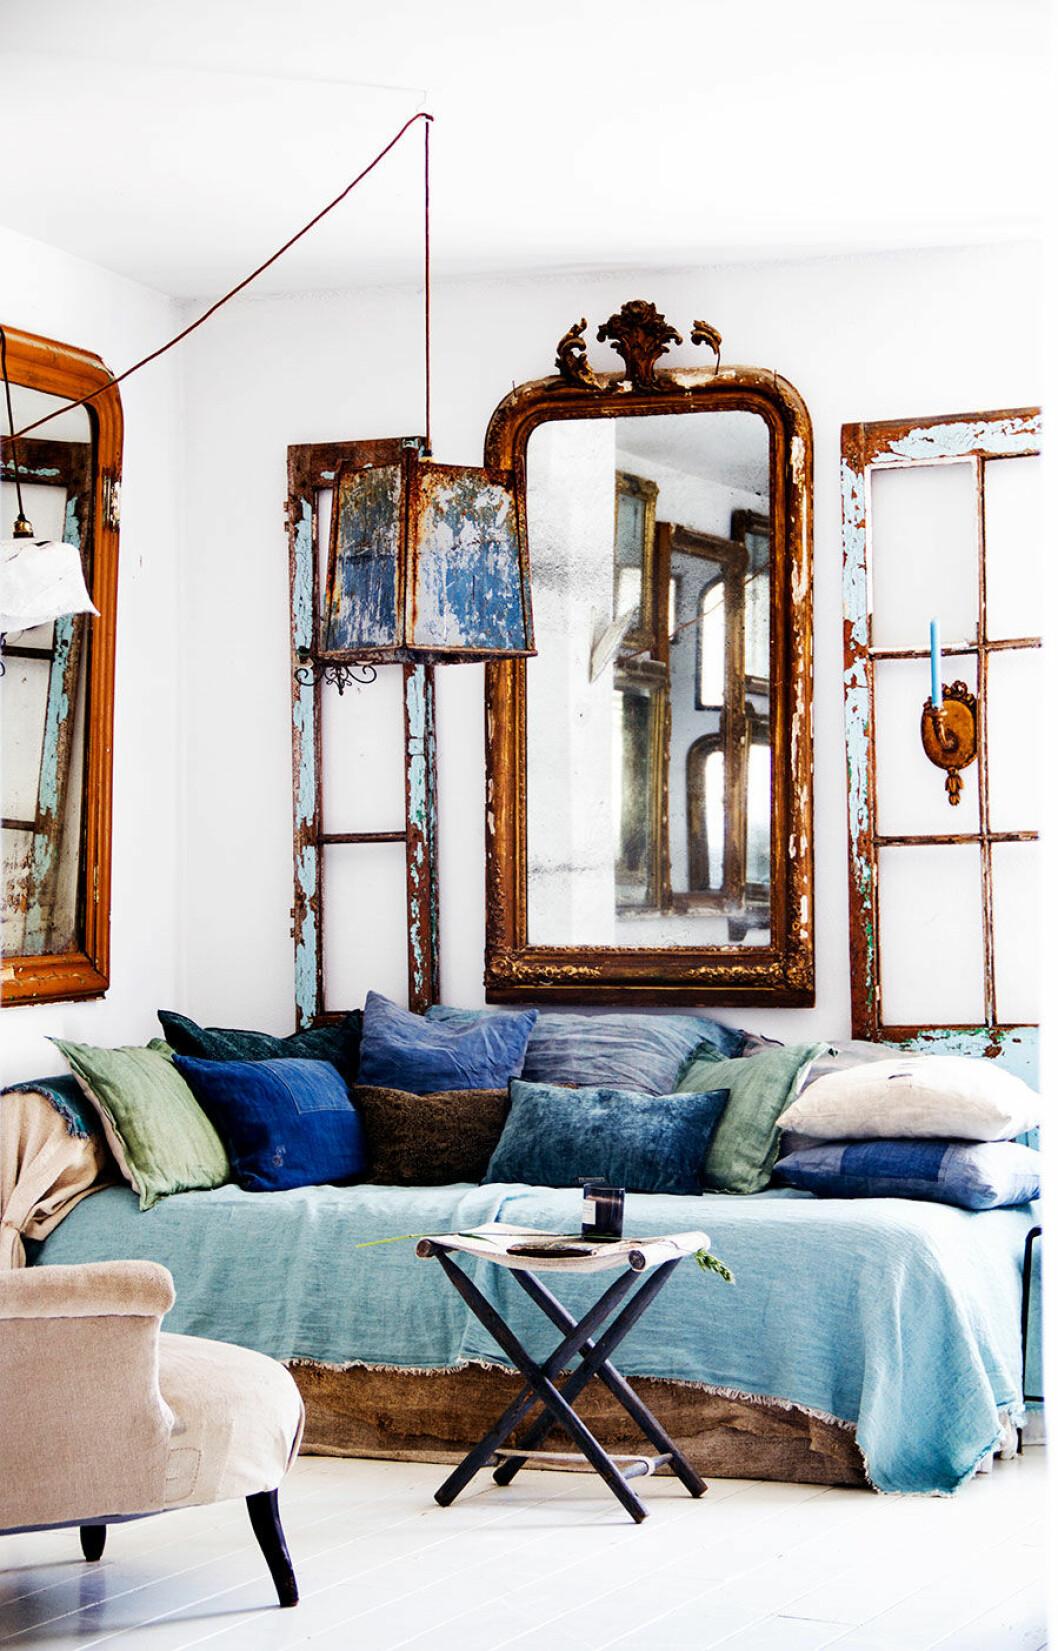 hans_blomquist_mirror_sofa_pillows_blue